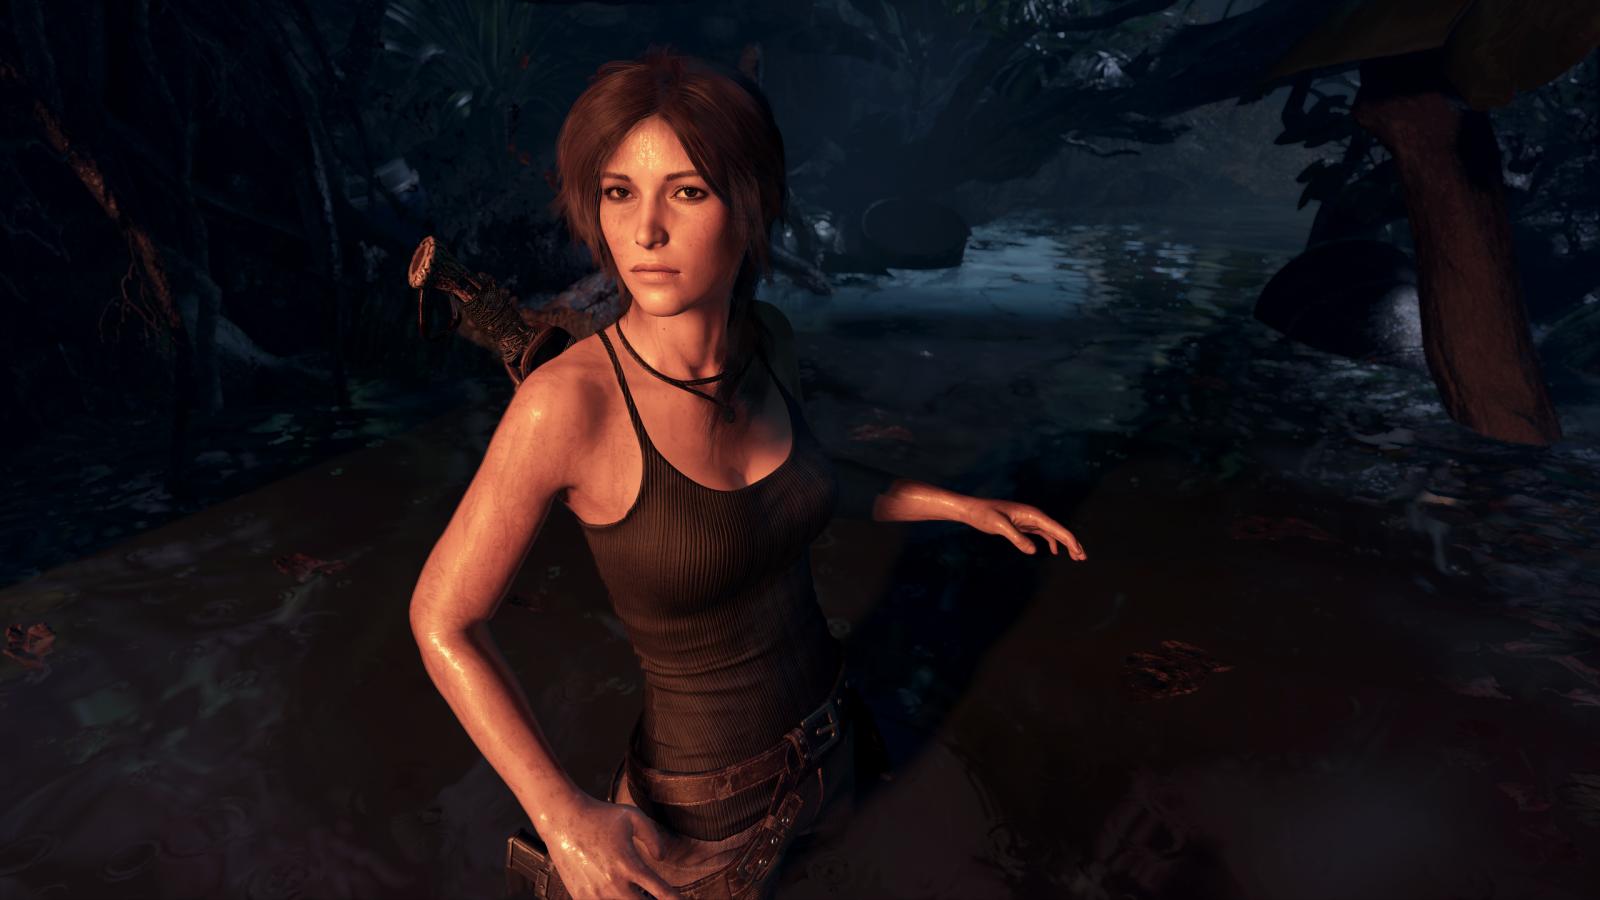 Lara_Croft_Tomb_Raider_Shadow_of_the_Tomb_Raider_video_games_screen_shot-1467949.png - Rise of the Tomb Raider